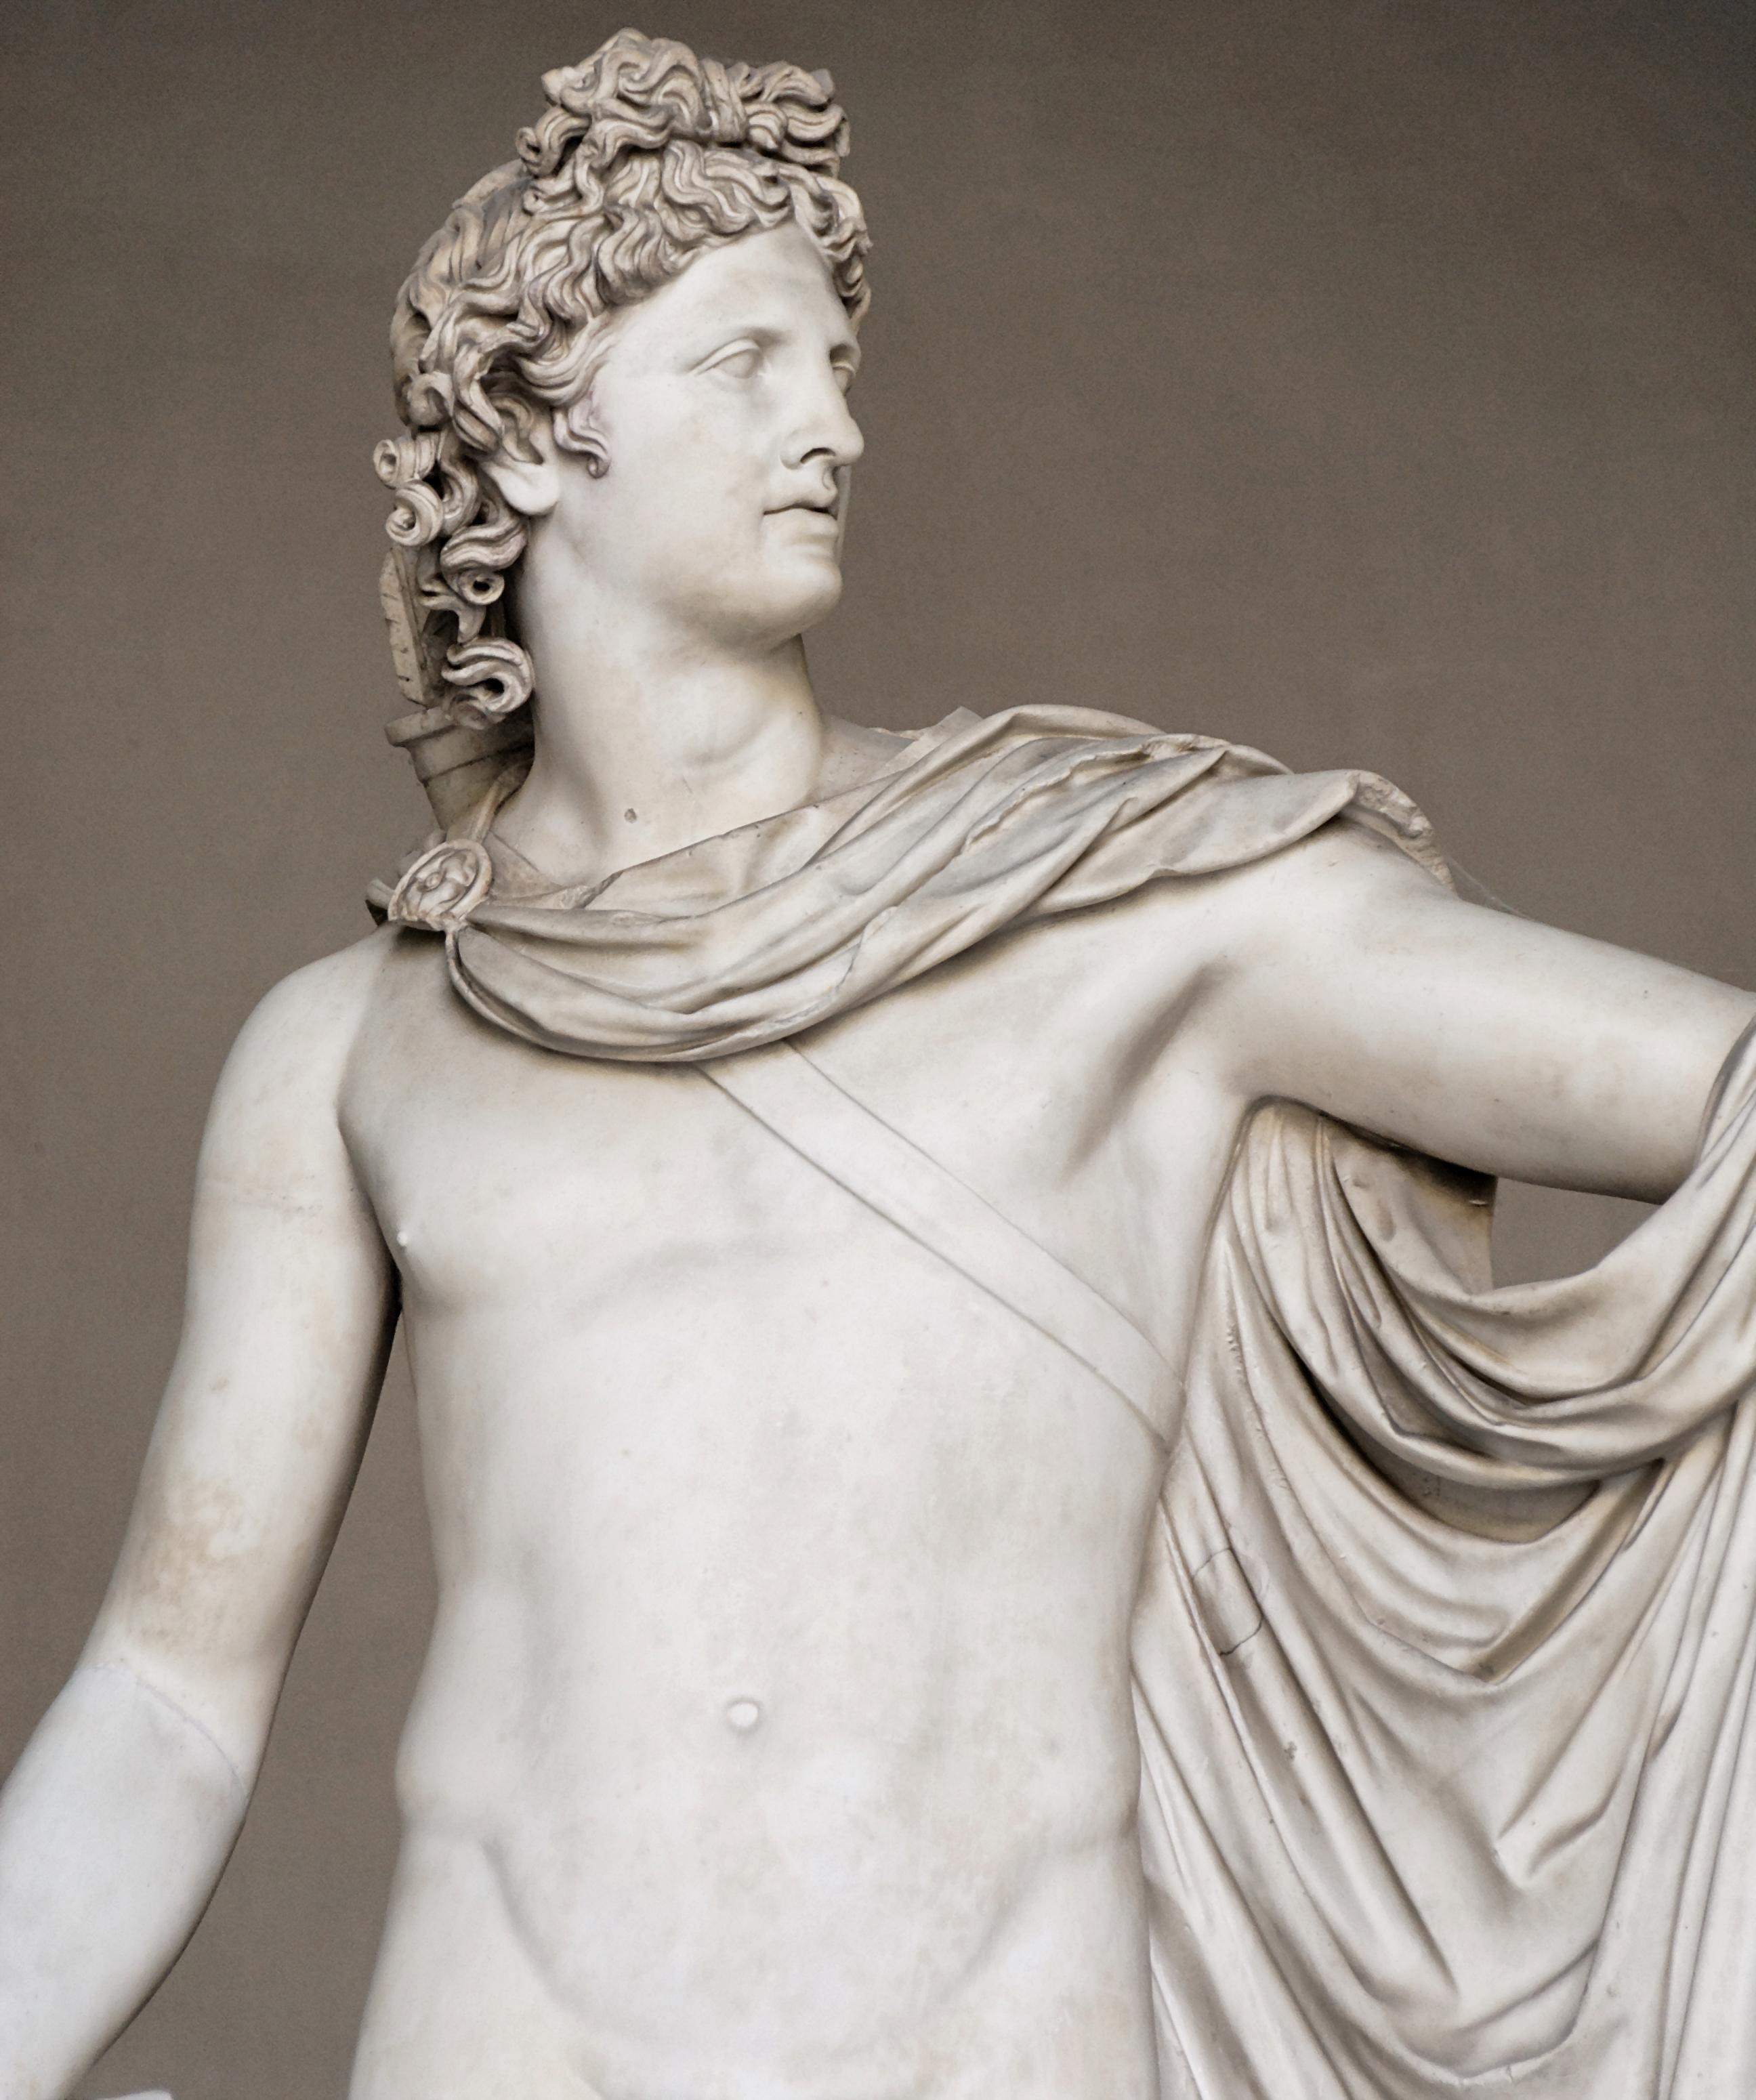 для аполлон греческий бог картинки разу скордамаглия